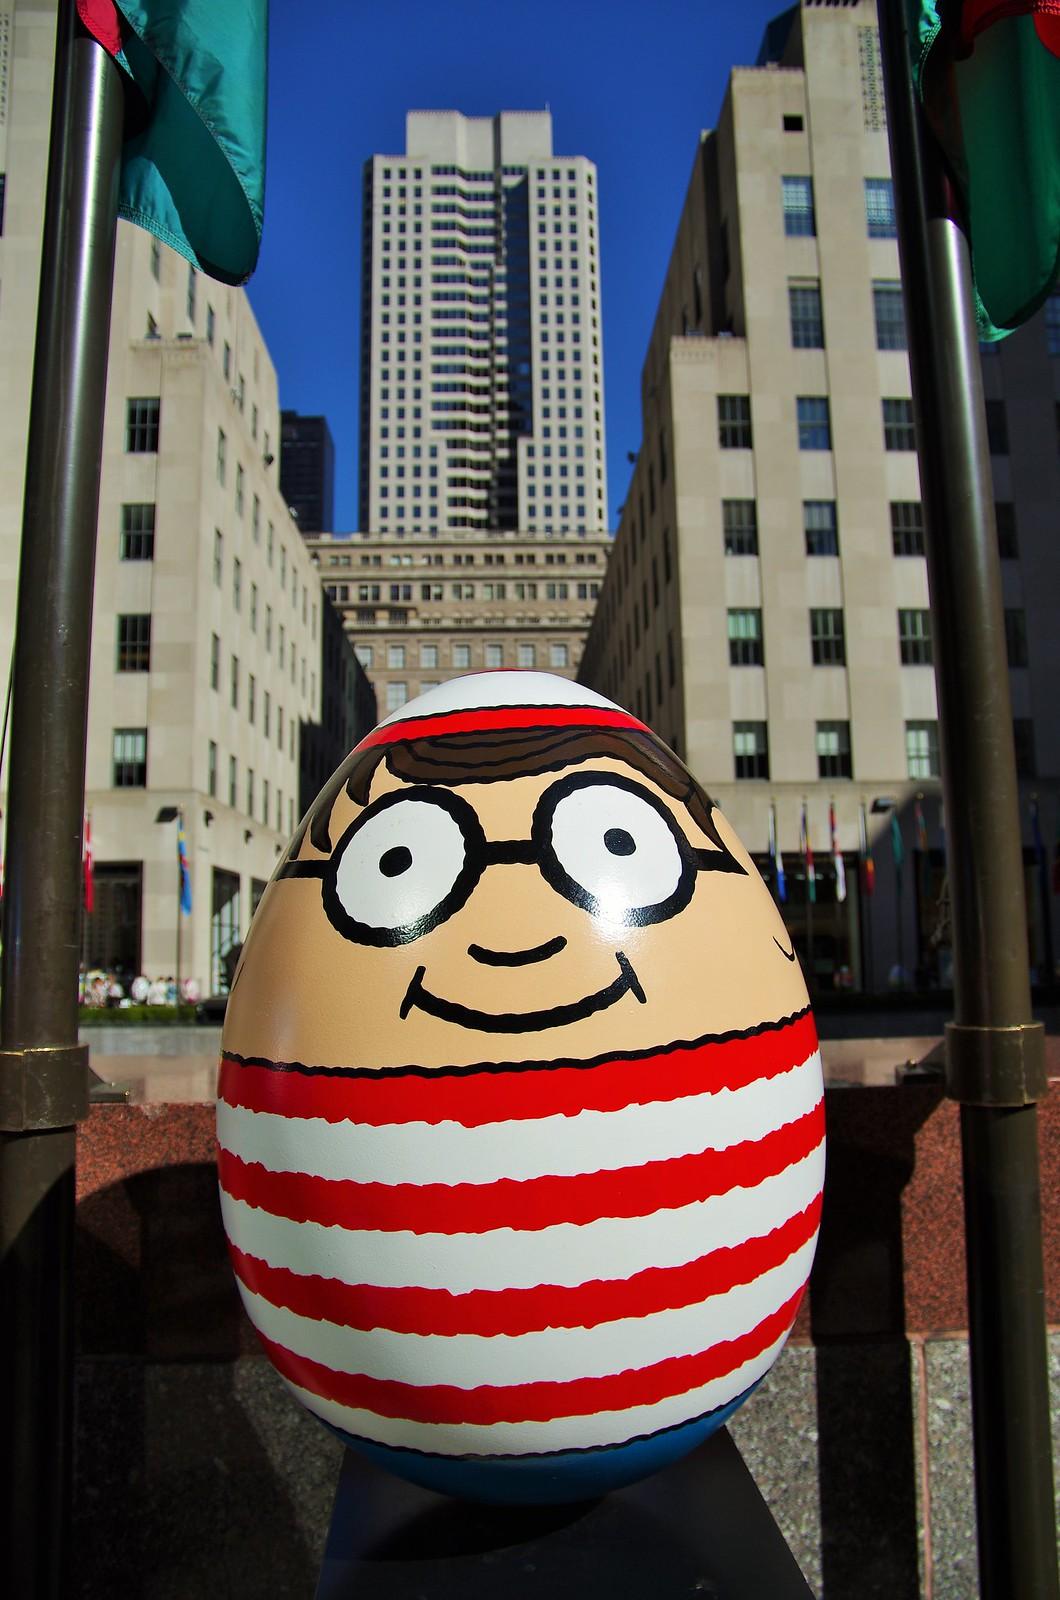 2014 紐約市復活節尋蛋活動 The Big Egg Hunt NYC